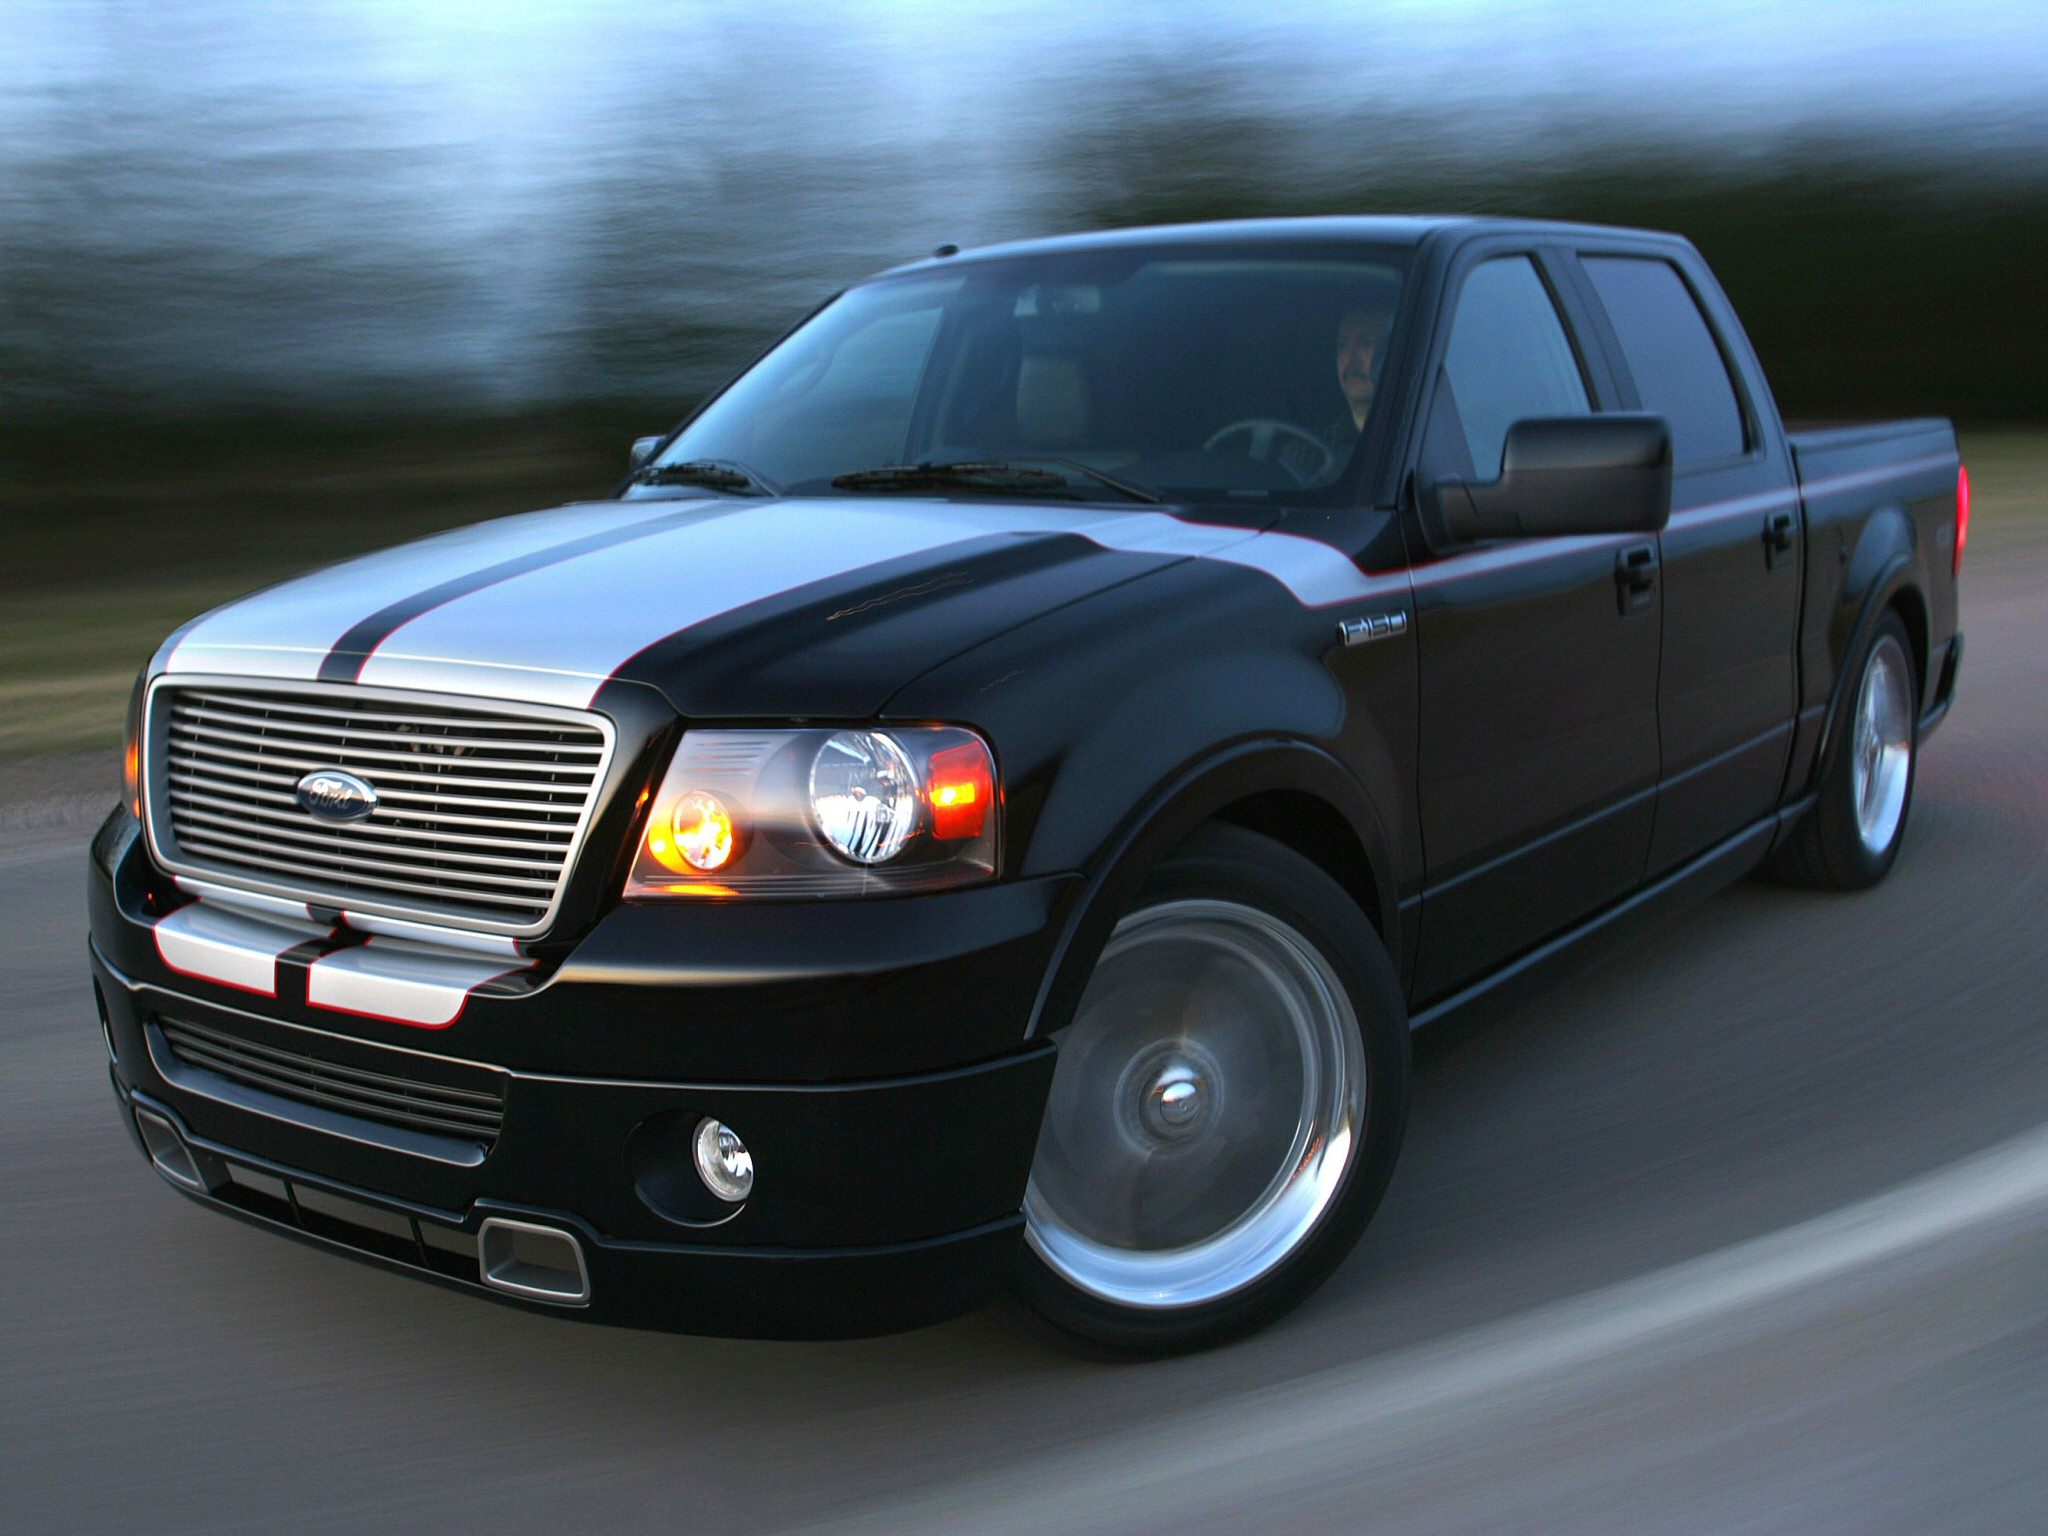 2007 ford f 150 foose truck tuning custom muscle e. Black Bedroom Furniture Sets. Home Design Ideas